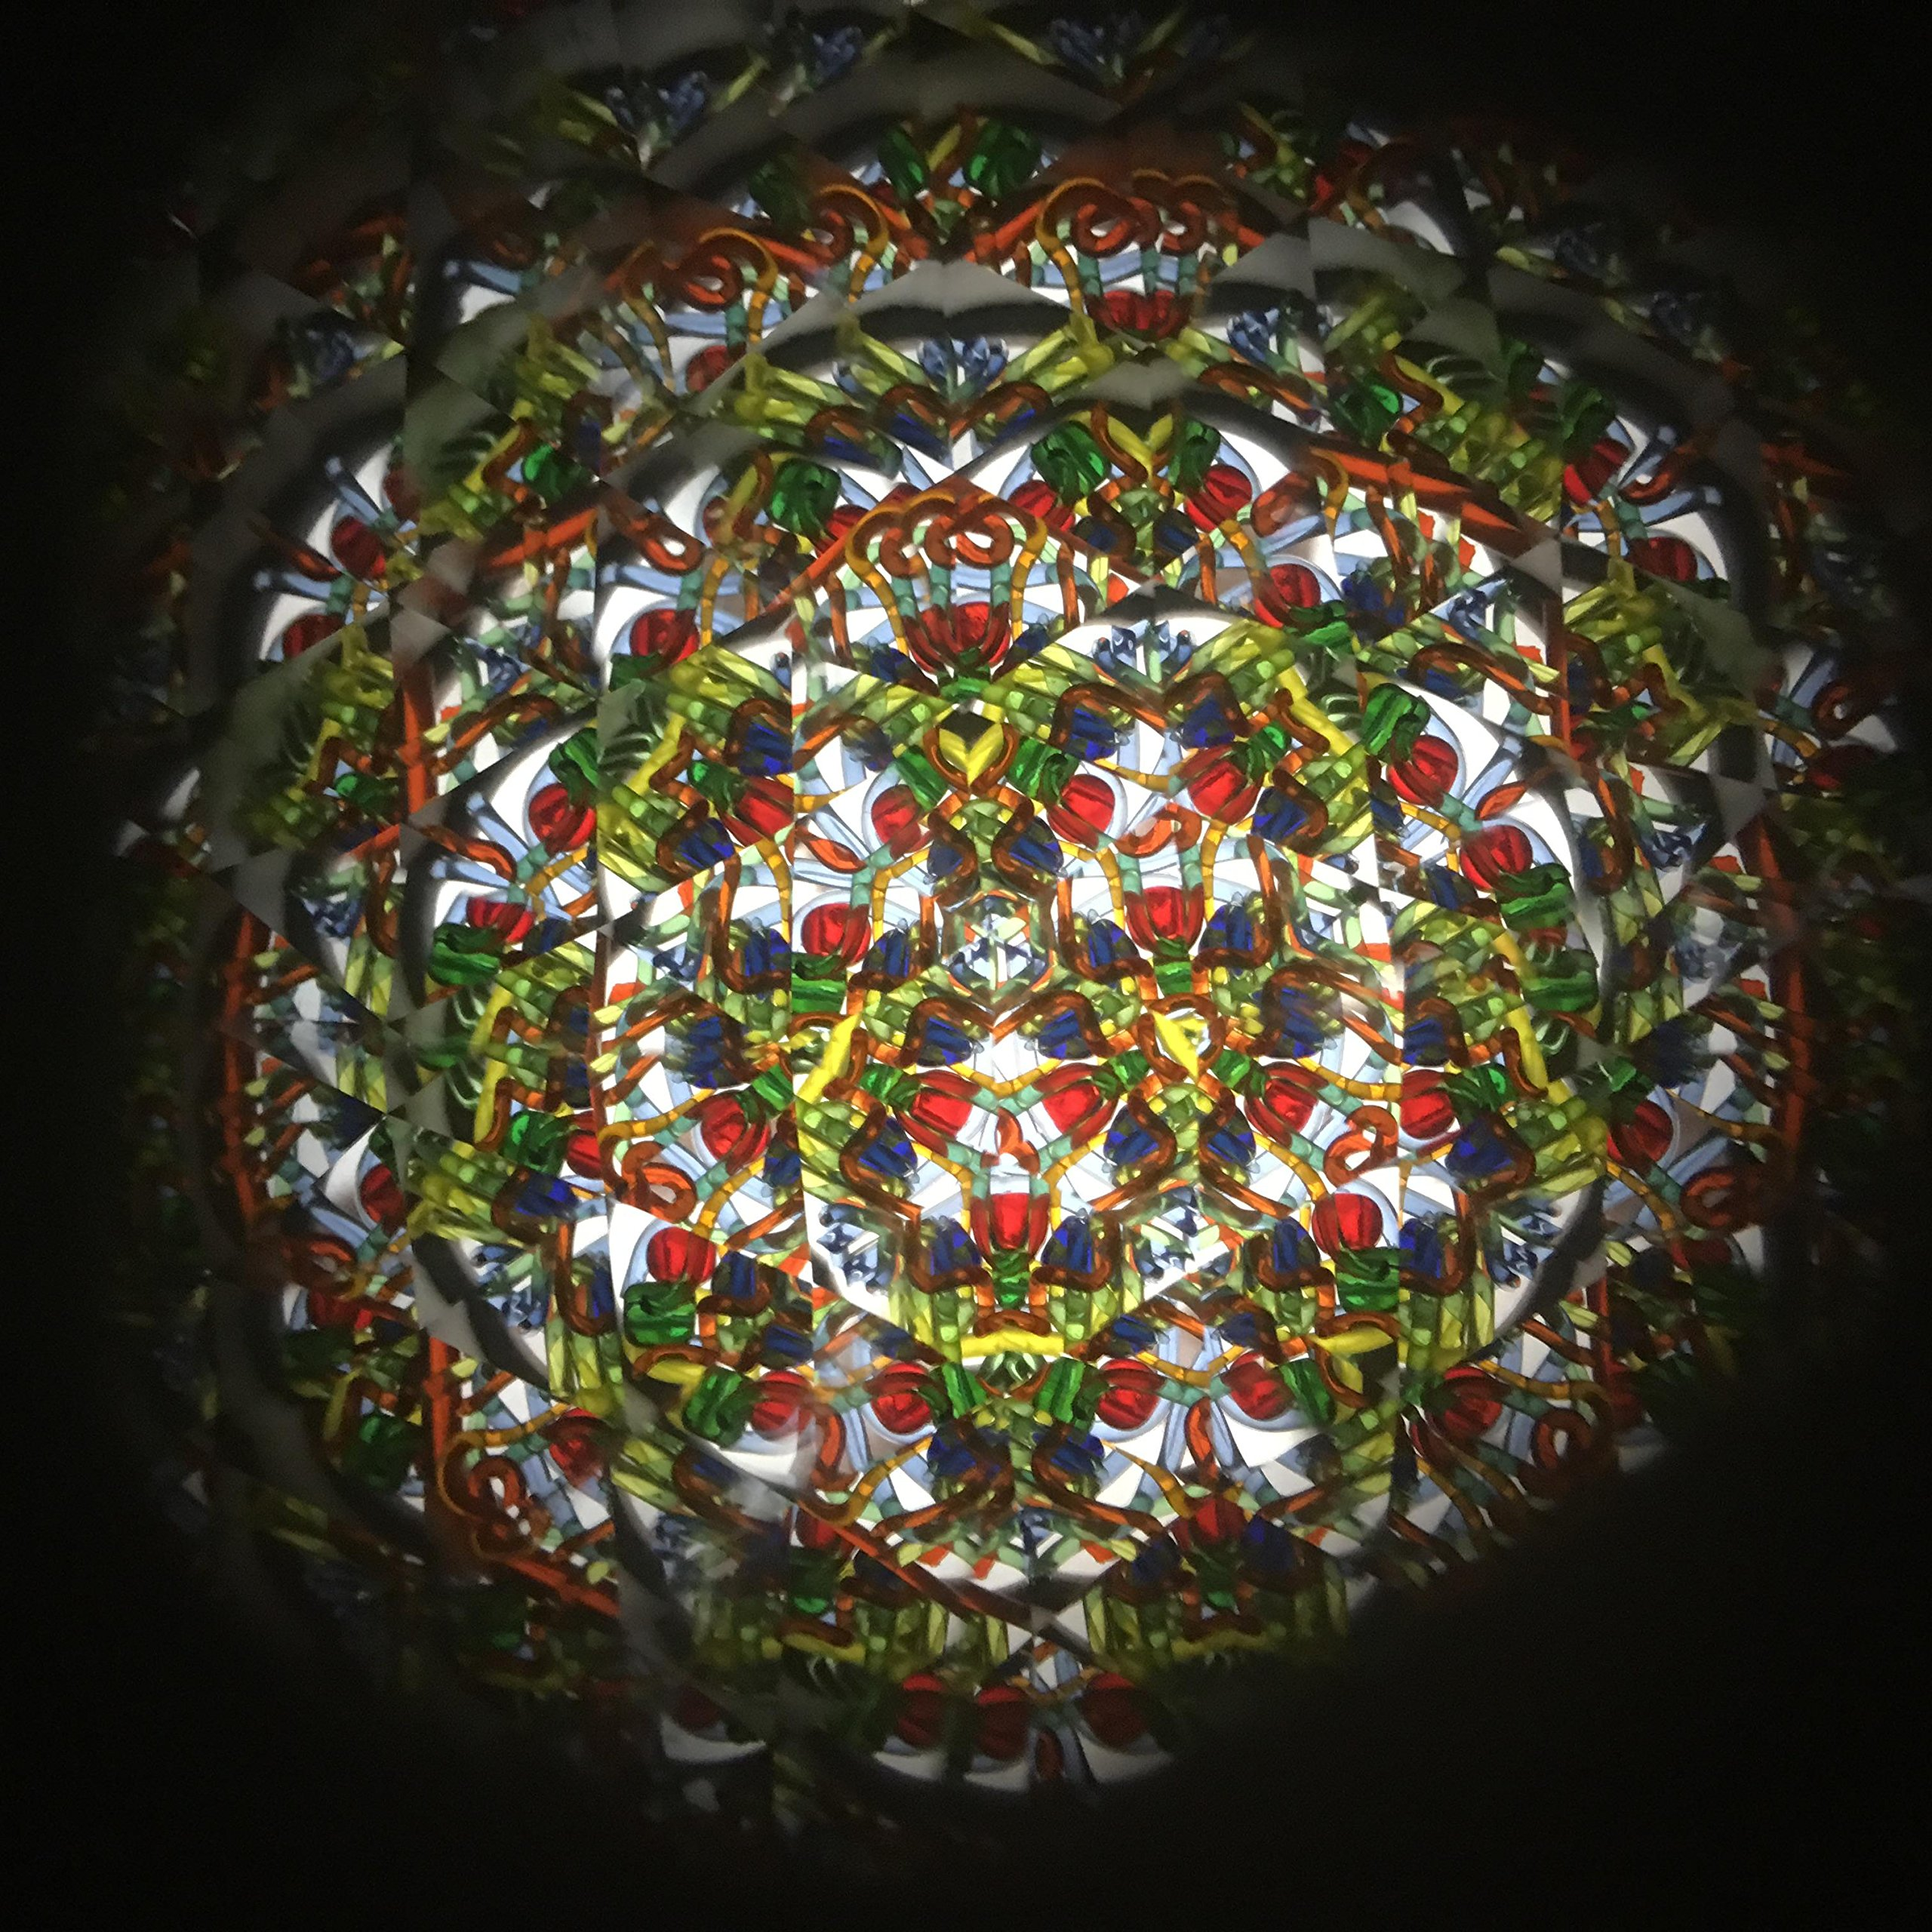 N & J Kaleidoscope in Solid Walnut Wood, 5 1/2 inch Barrel, Separate Beaded Turning Chamber by N & J (Image #7)